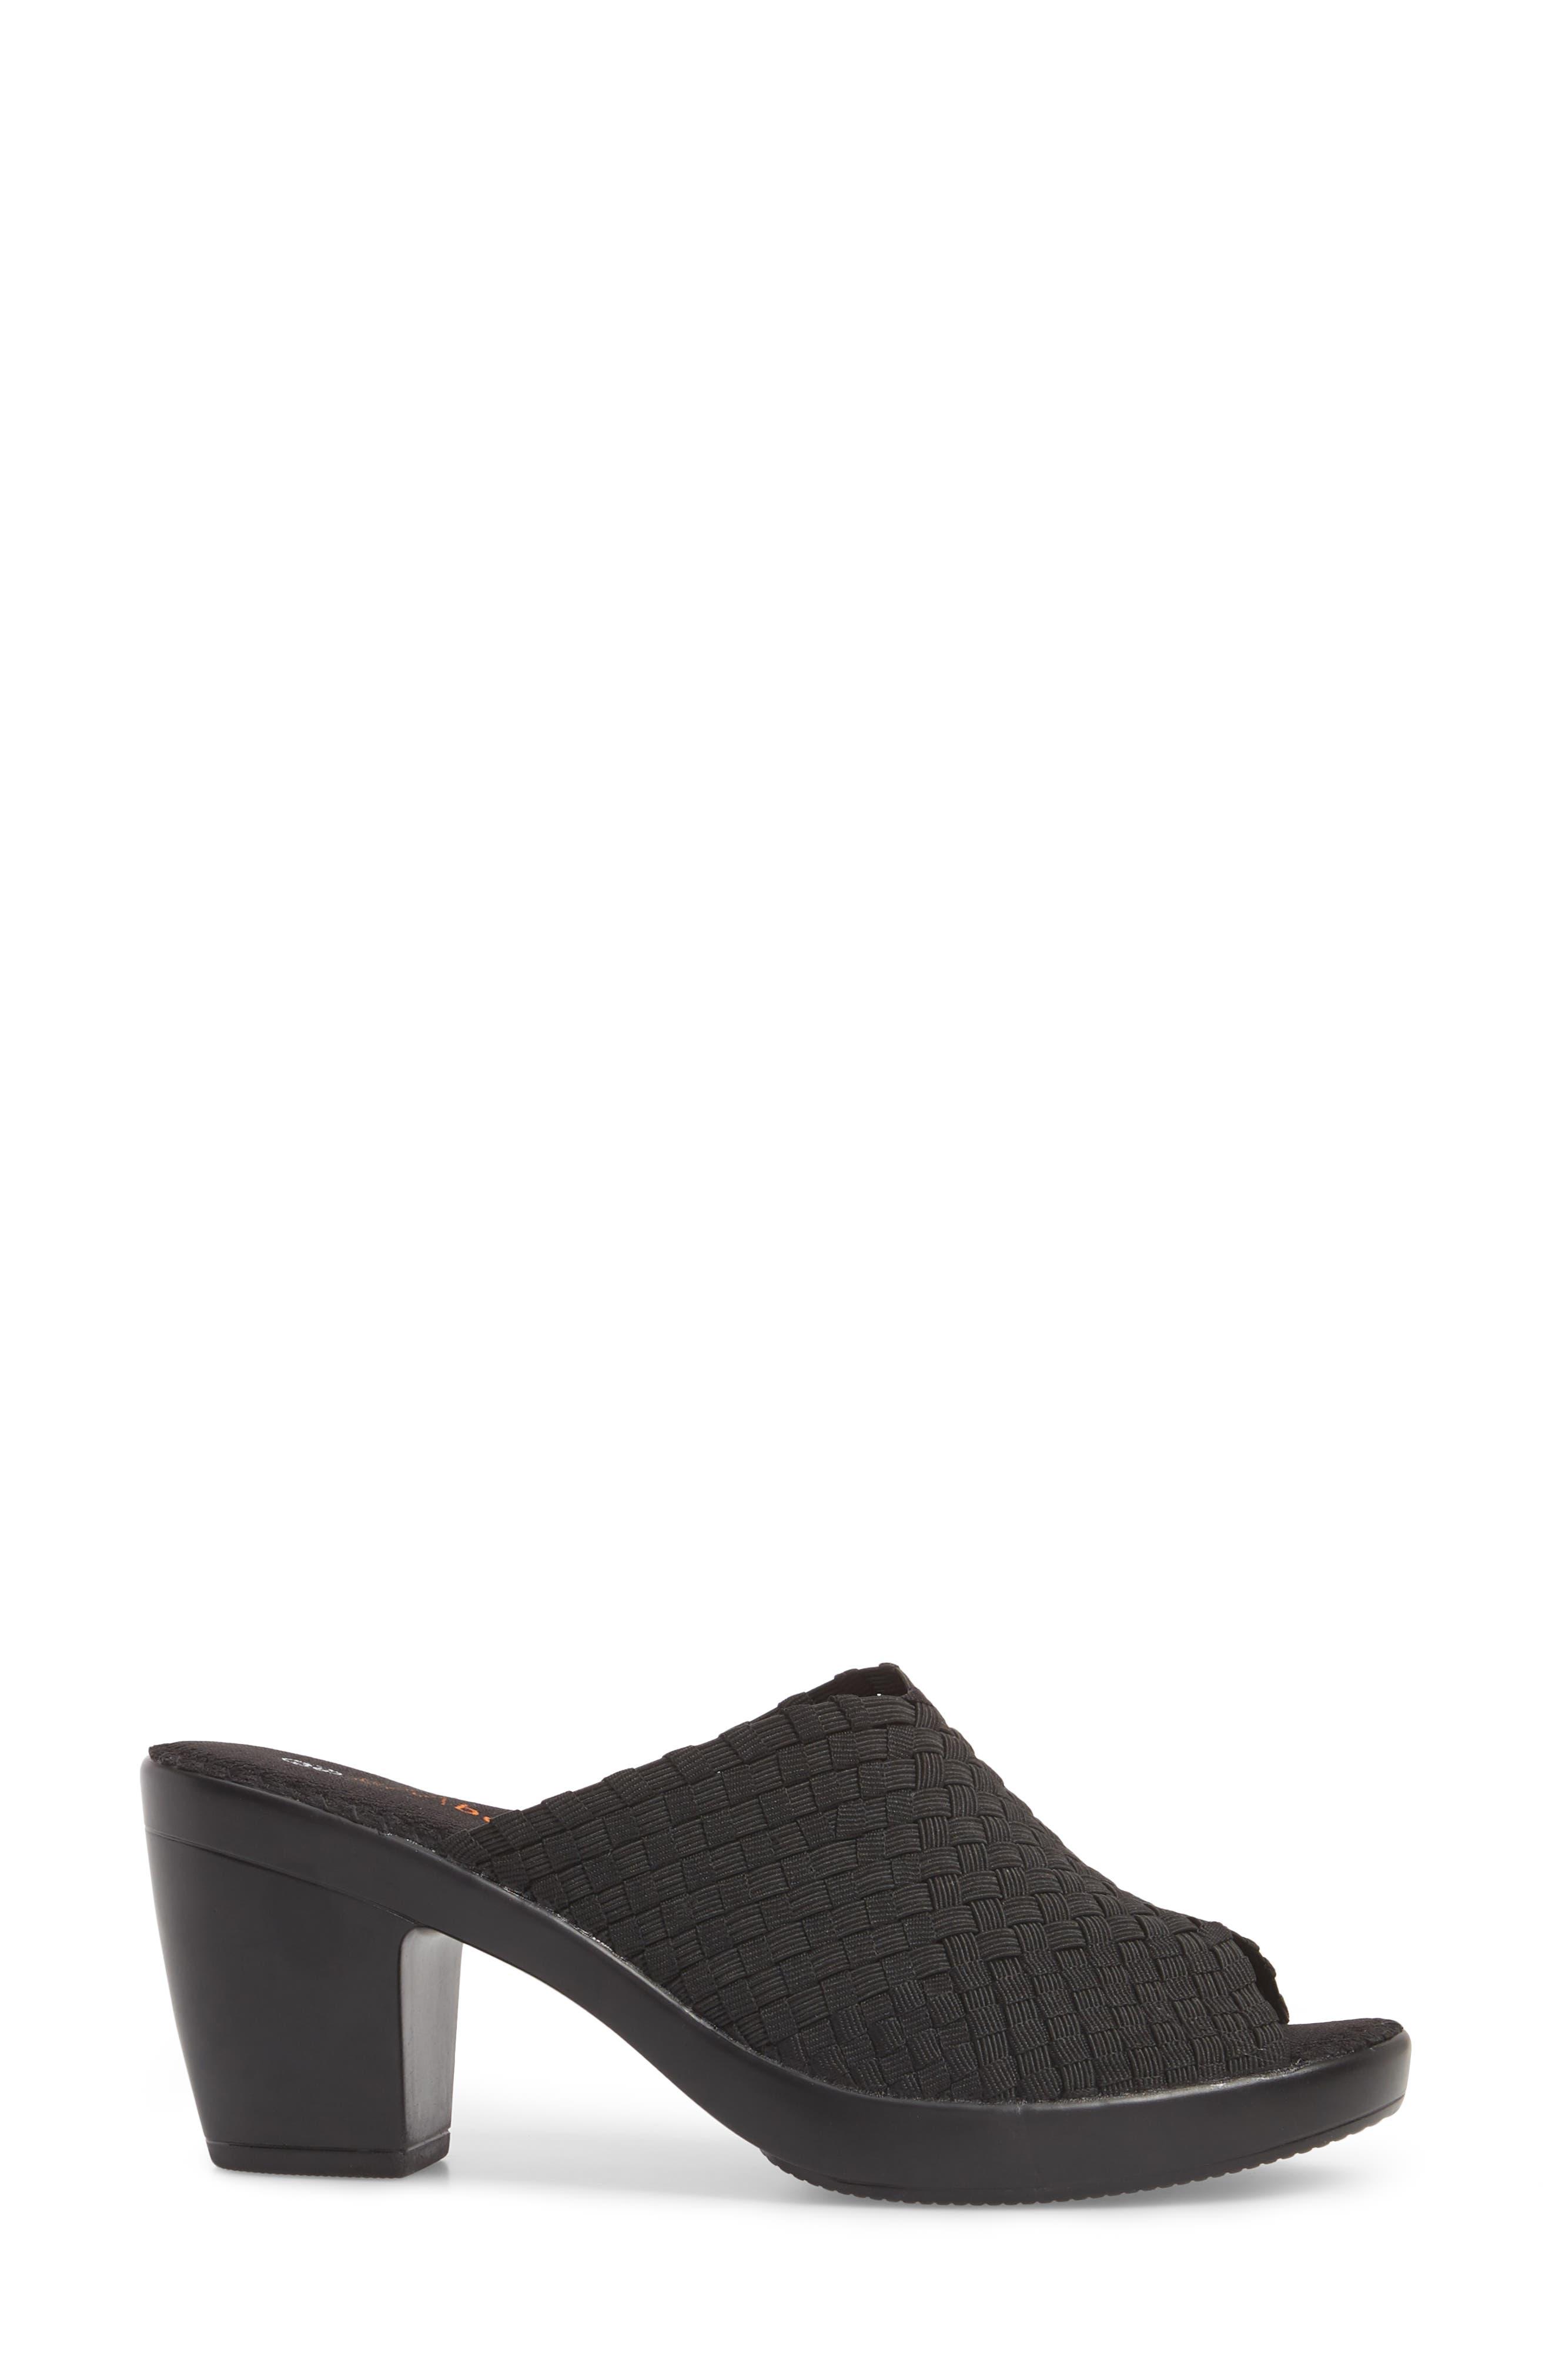 Sun Texas Sandal,                             Alternate thumbnail 3, color,                             BLACK FABRIC